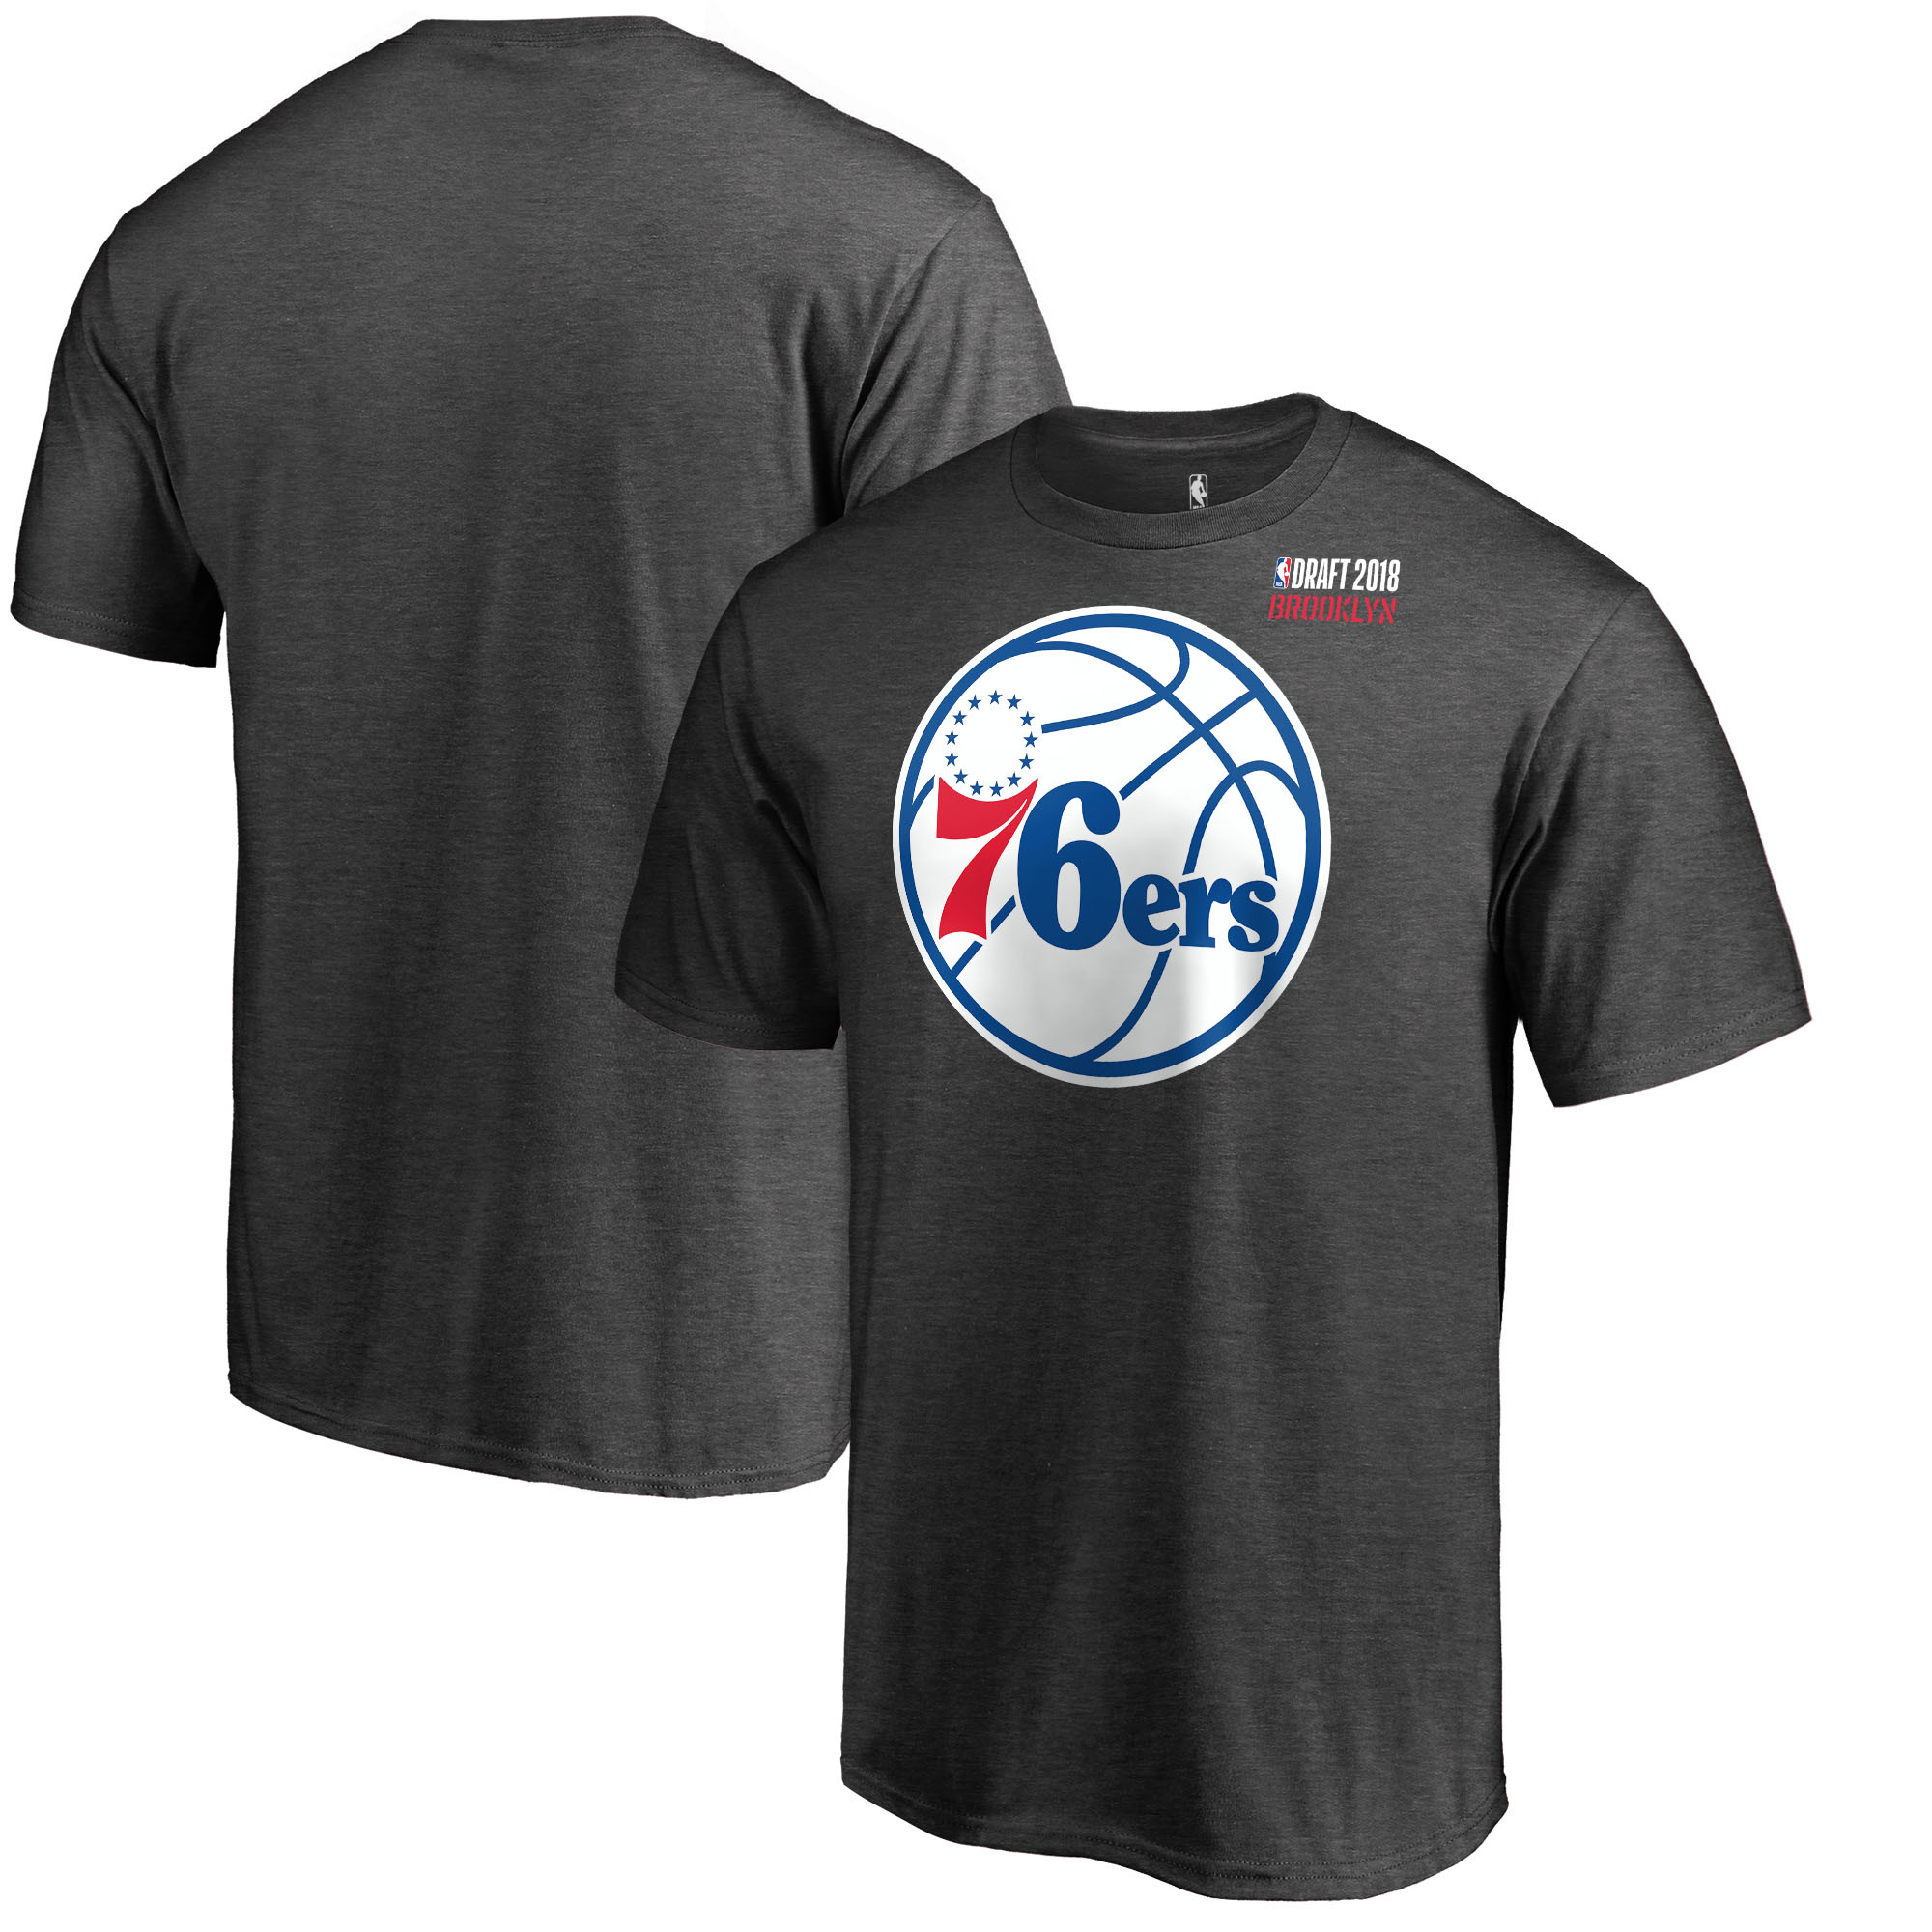 Philadelphia 76ers Fanatics Branded 2018 NBA Draft BKLYN T-Shirt - Heather Gray